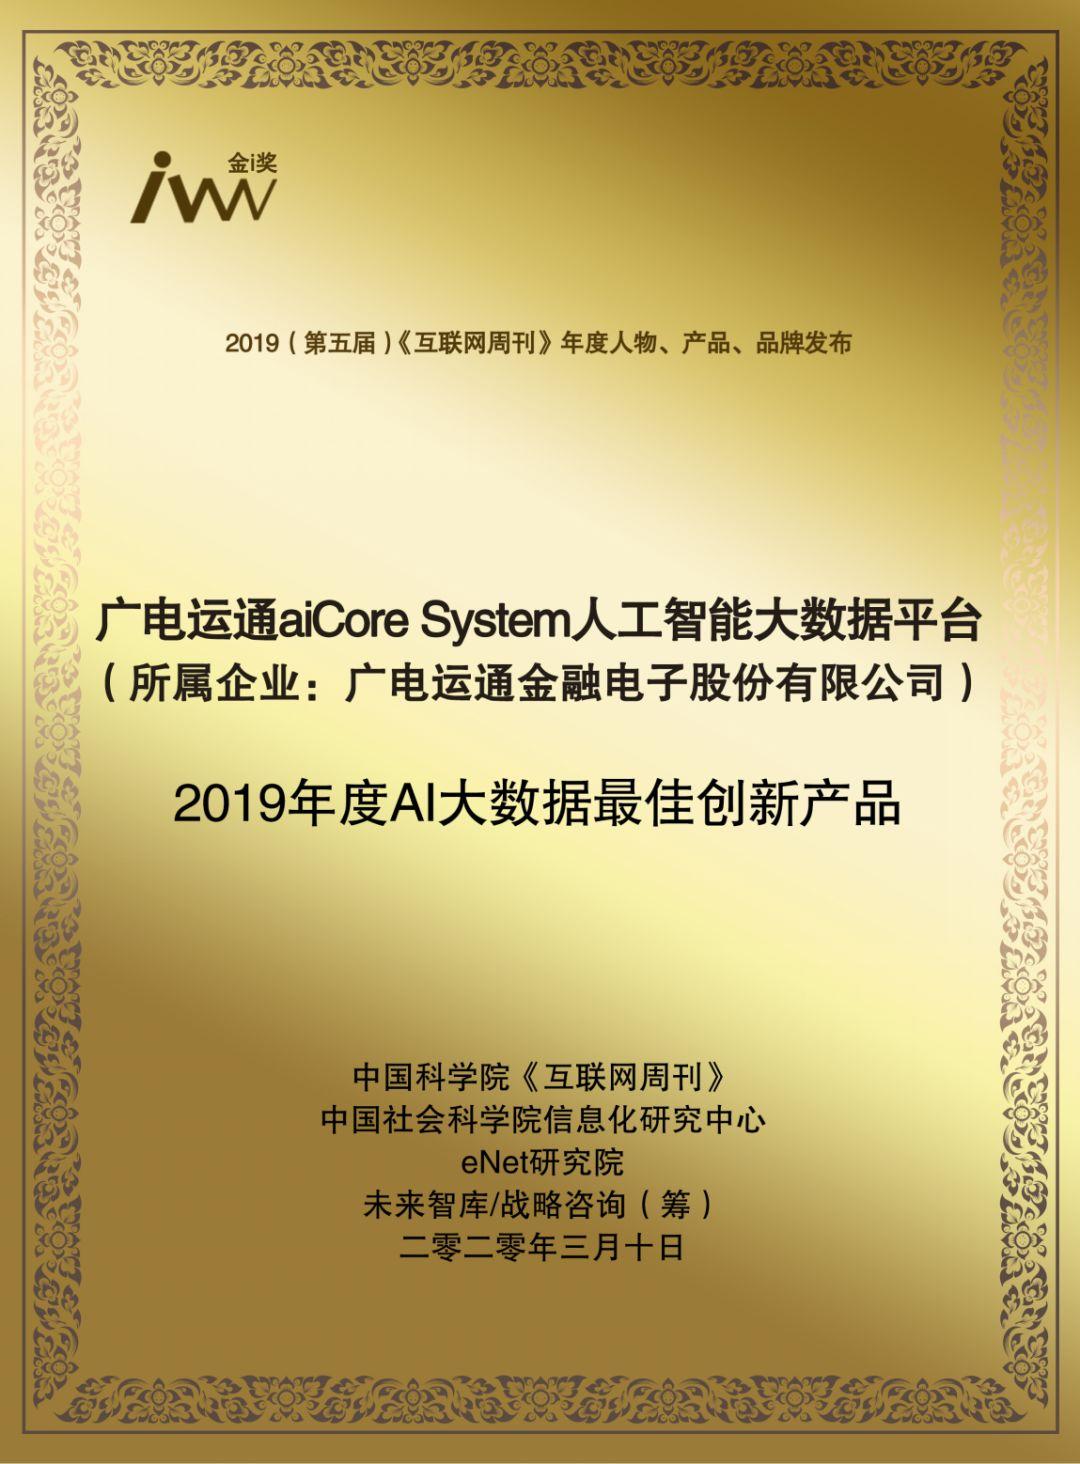 aiCoreSystem跻身2019年度AI大数据最佳创新产品